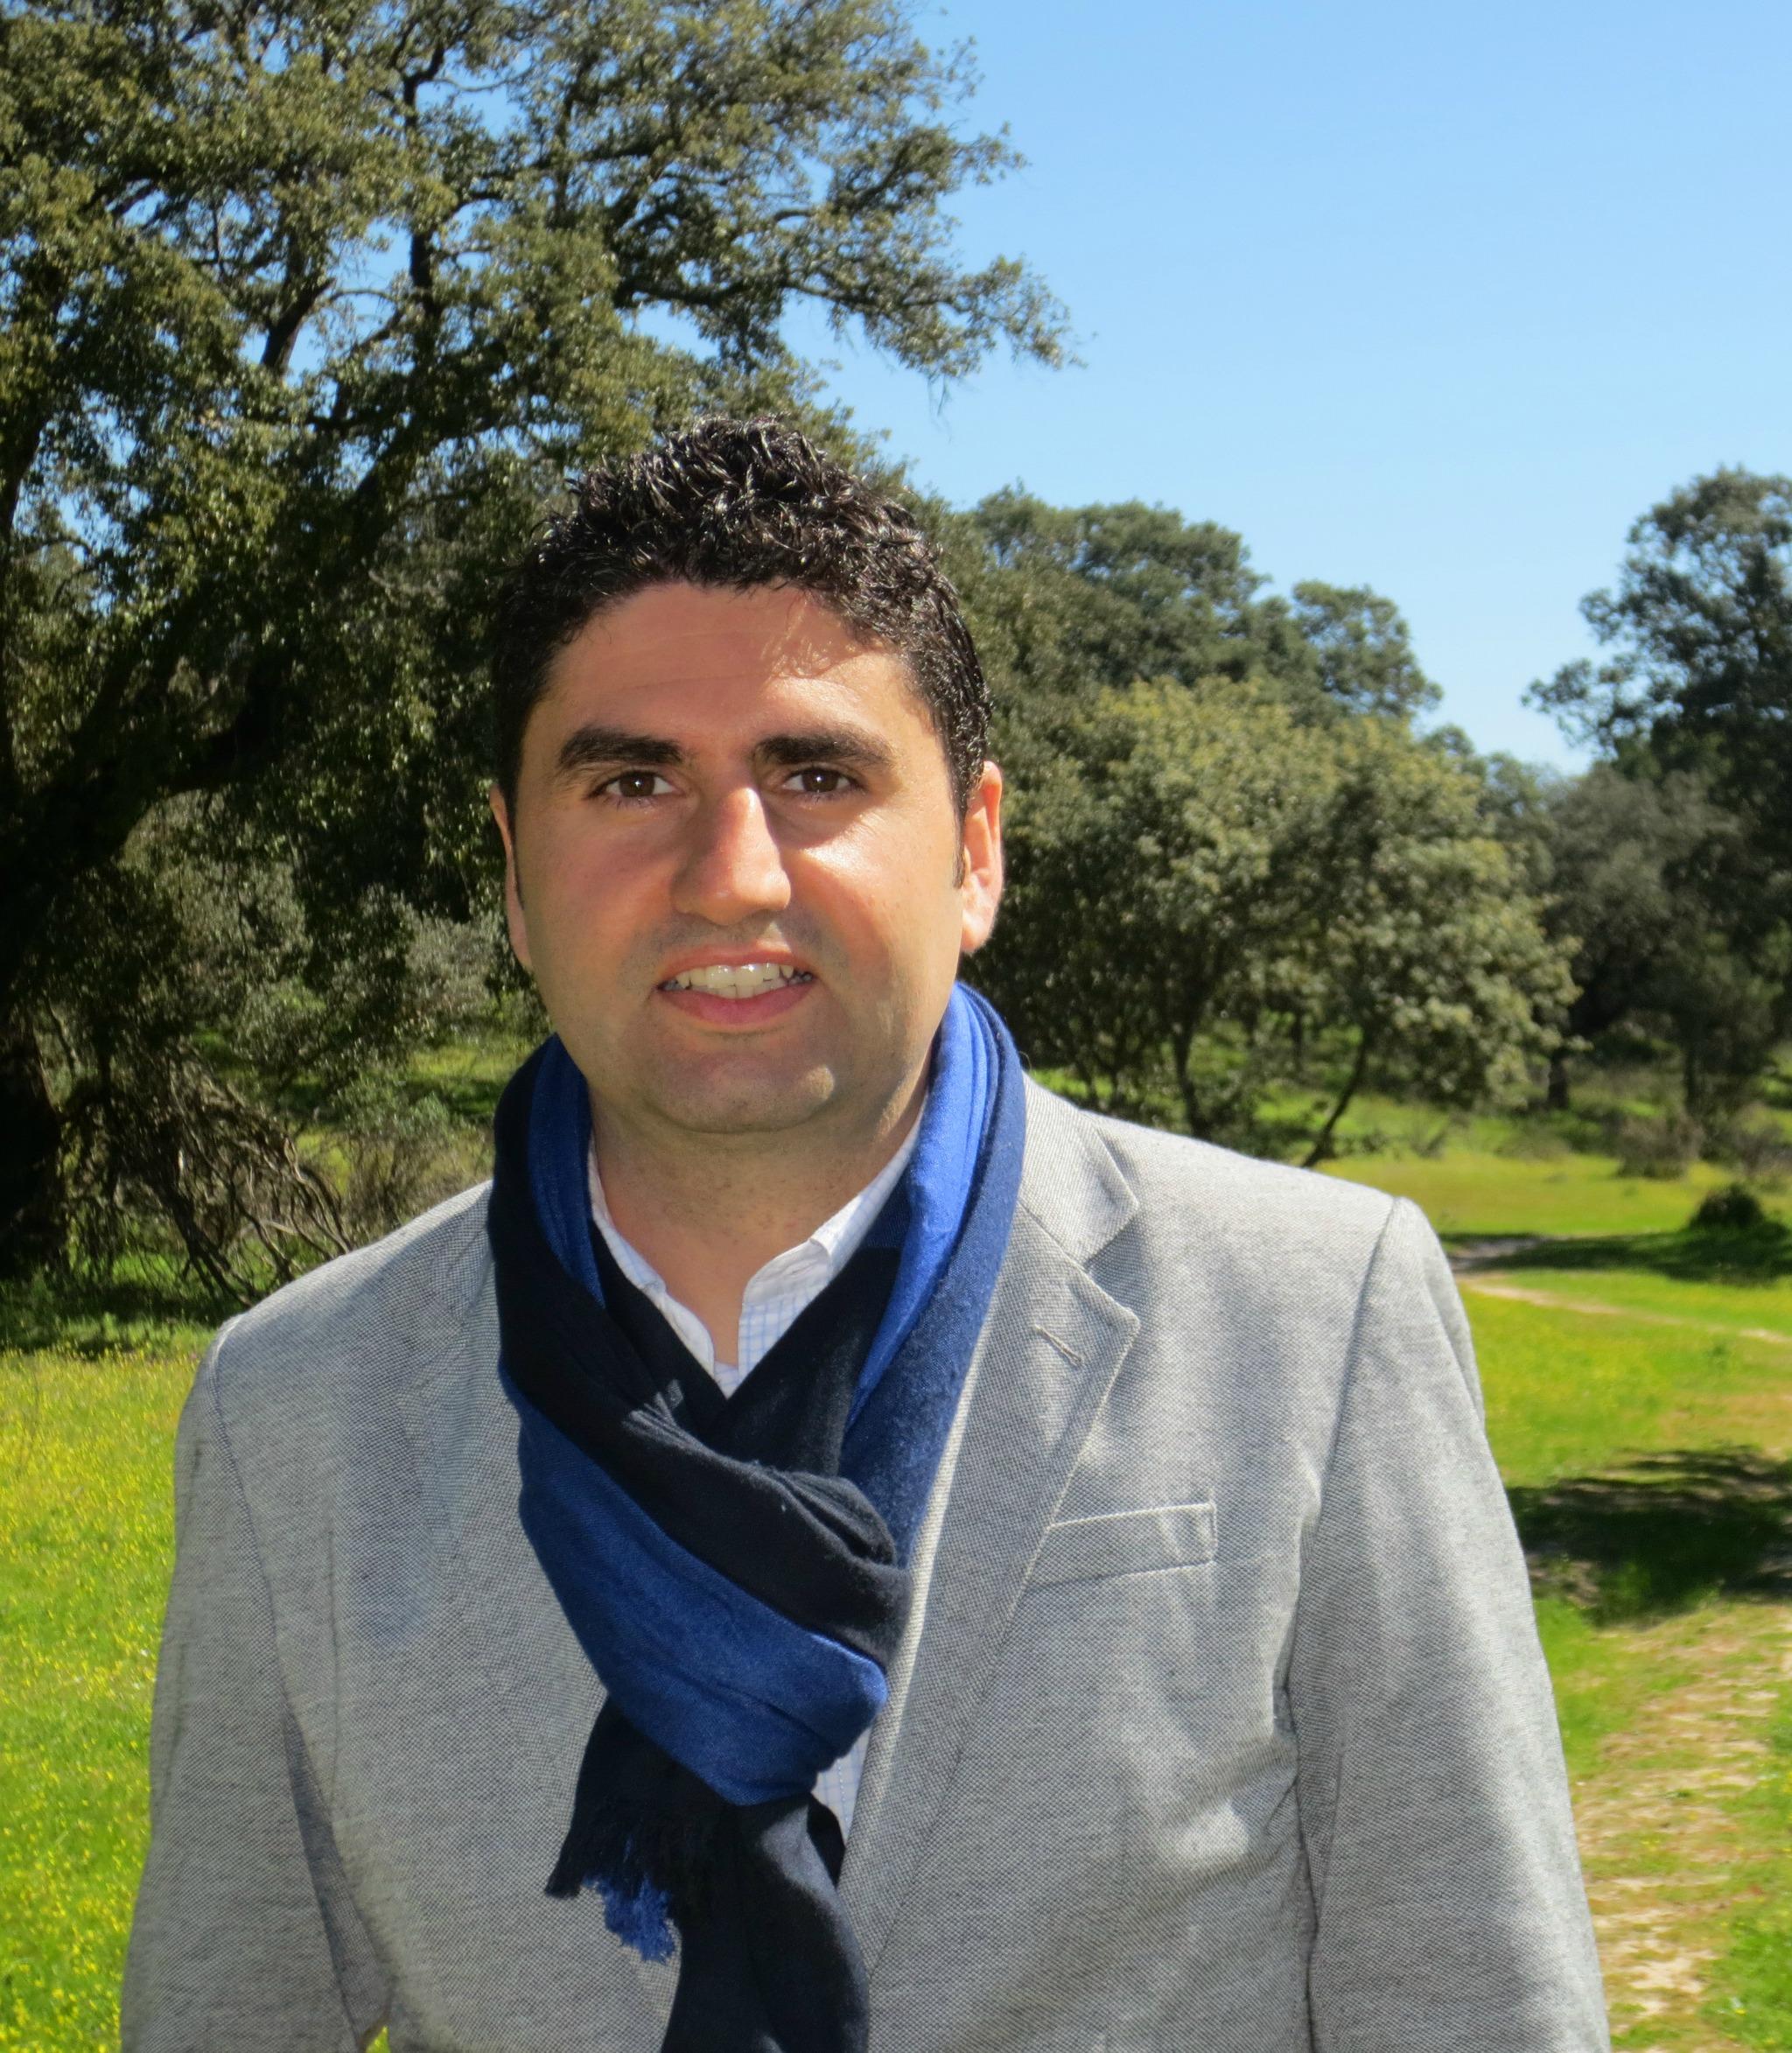 David Álvarez, Executive Director of Ecoacsa